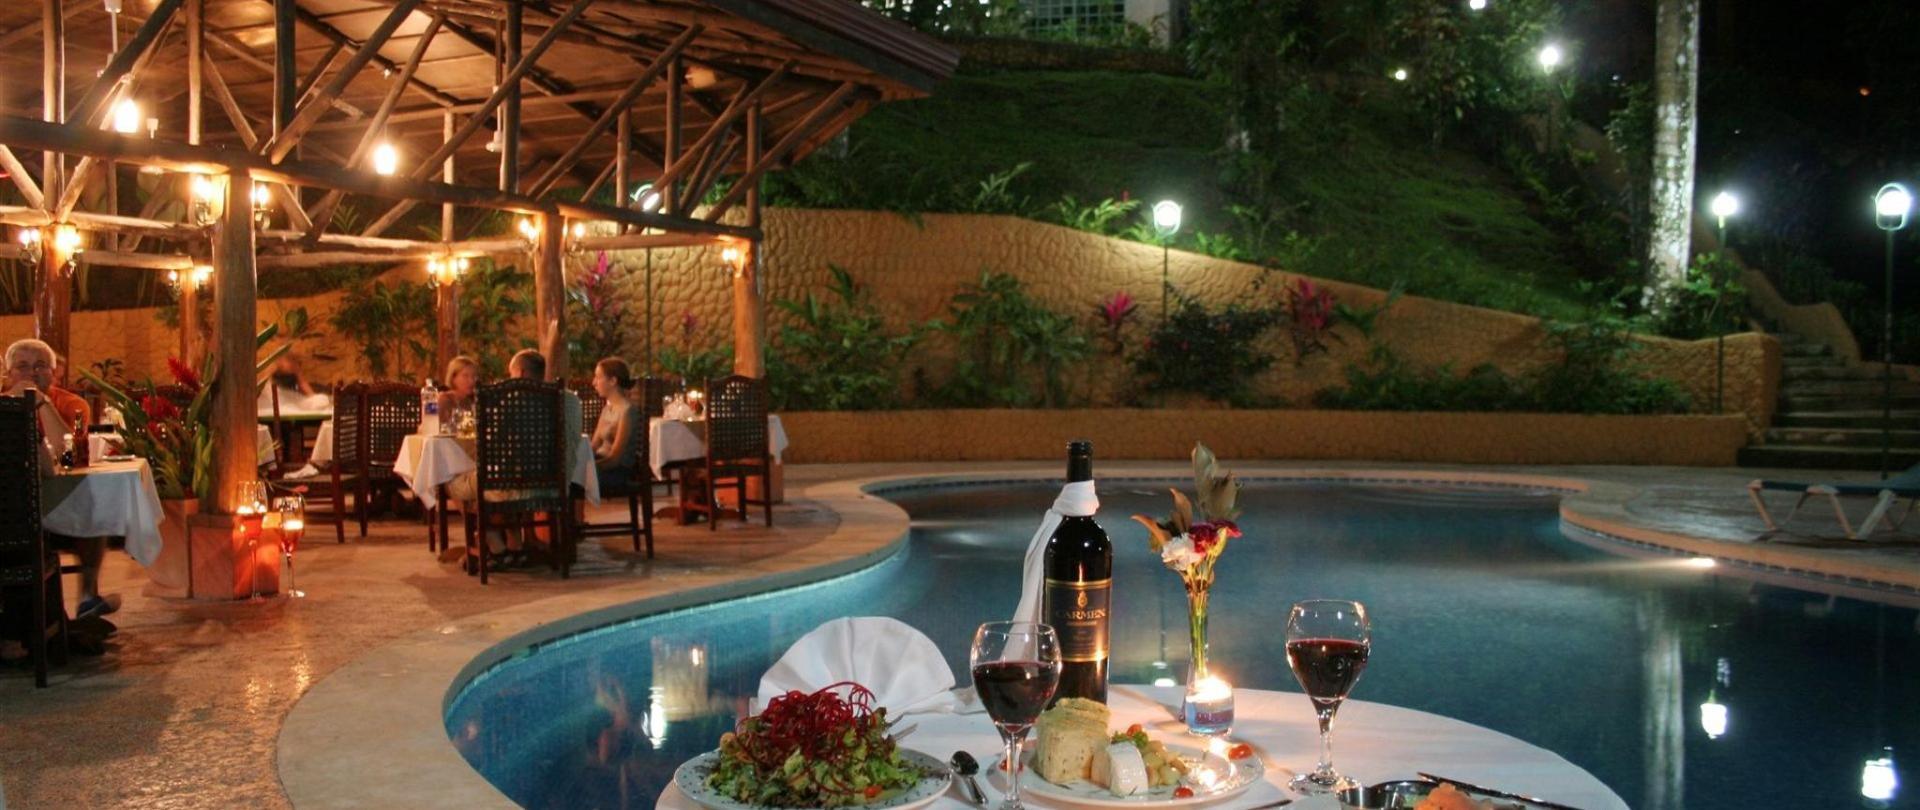 poolside-romance-bistro-restaurant.jpg